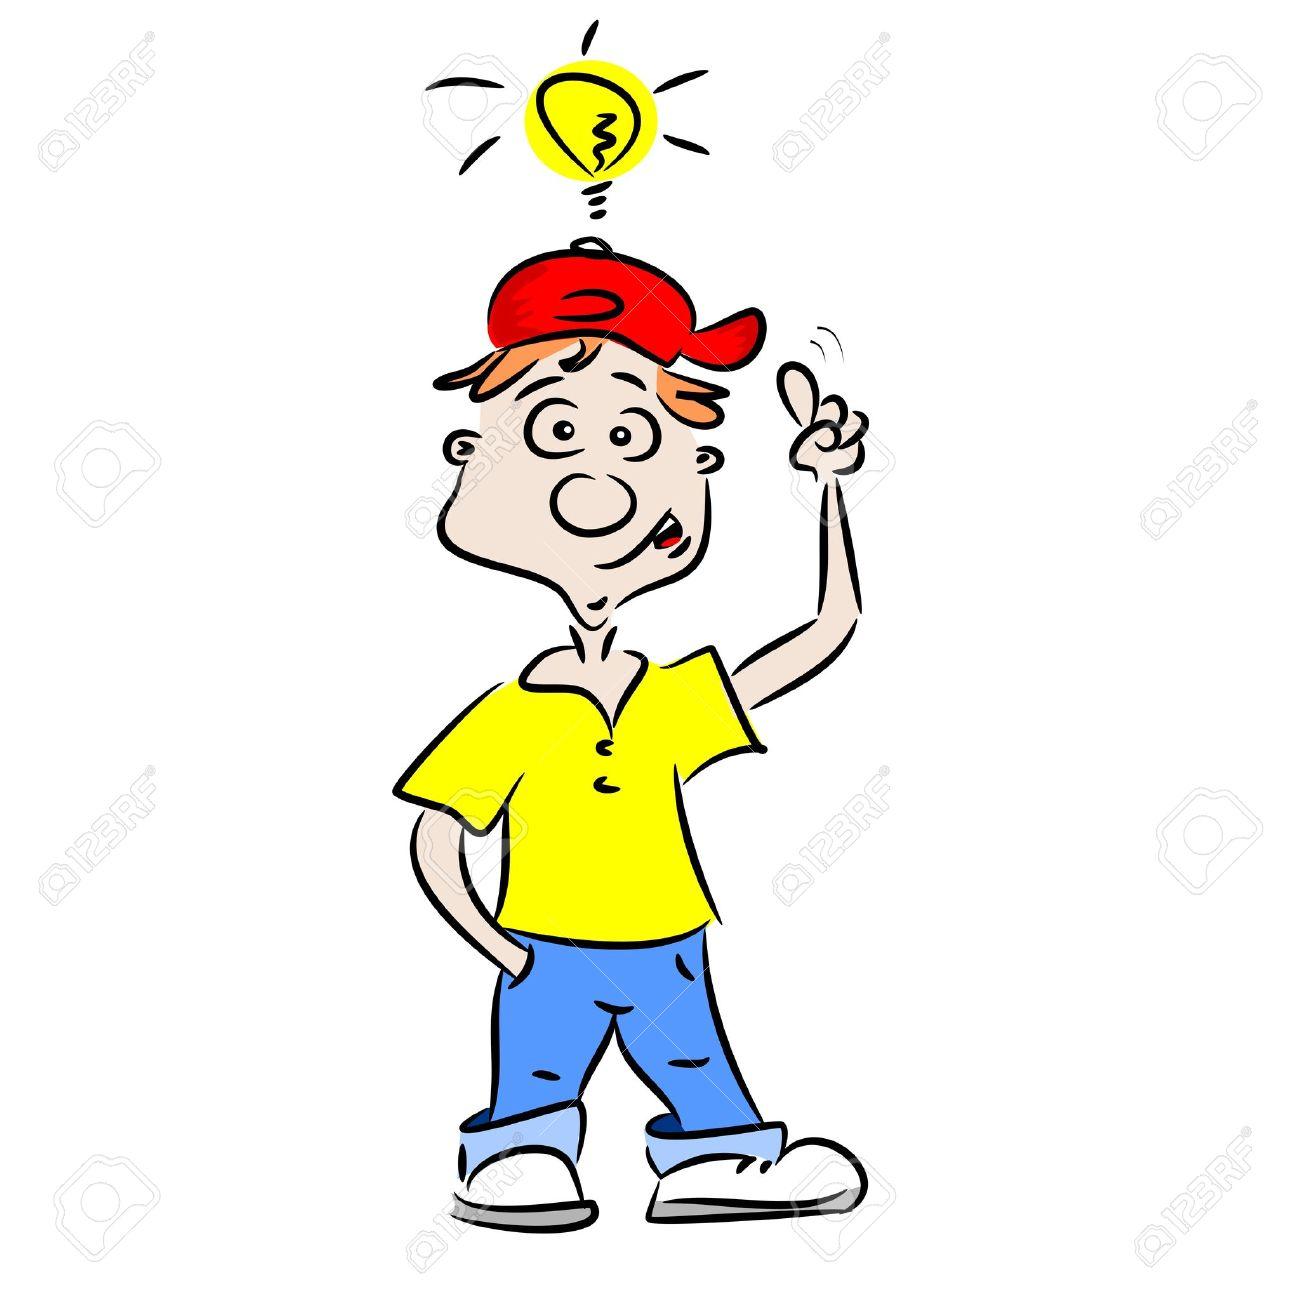 a cartoon boy with a good idea royalty free cliparts vectors and